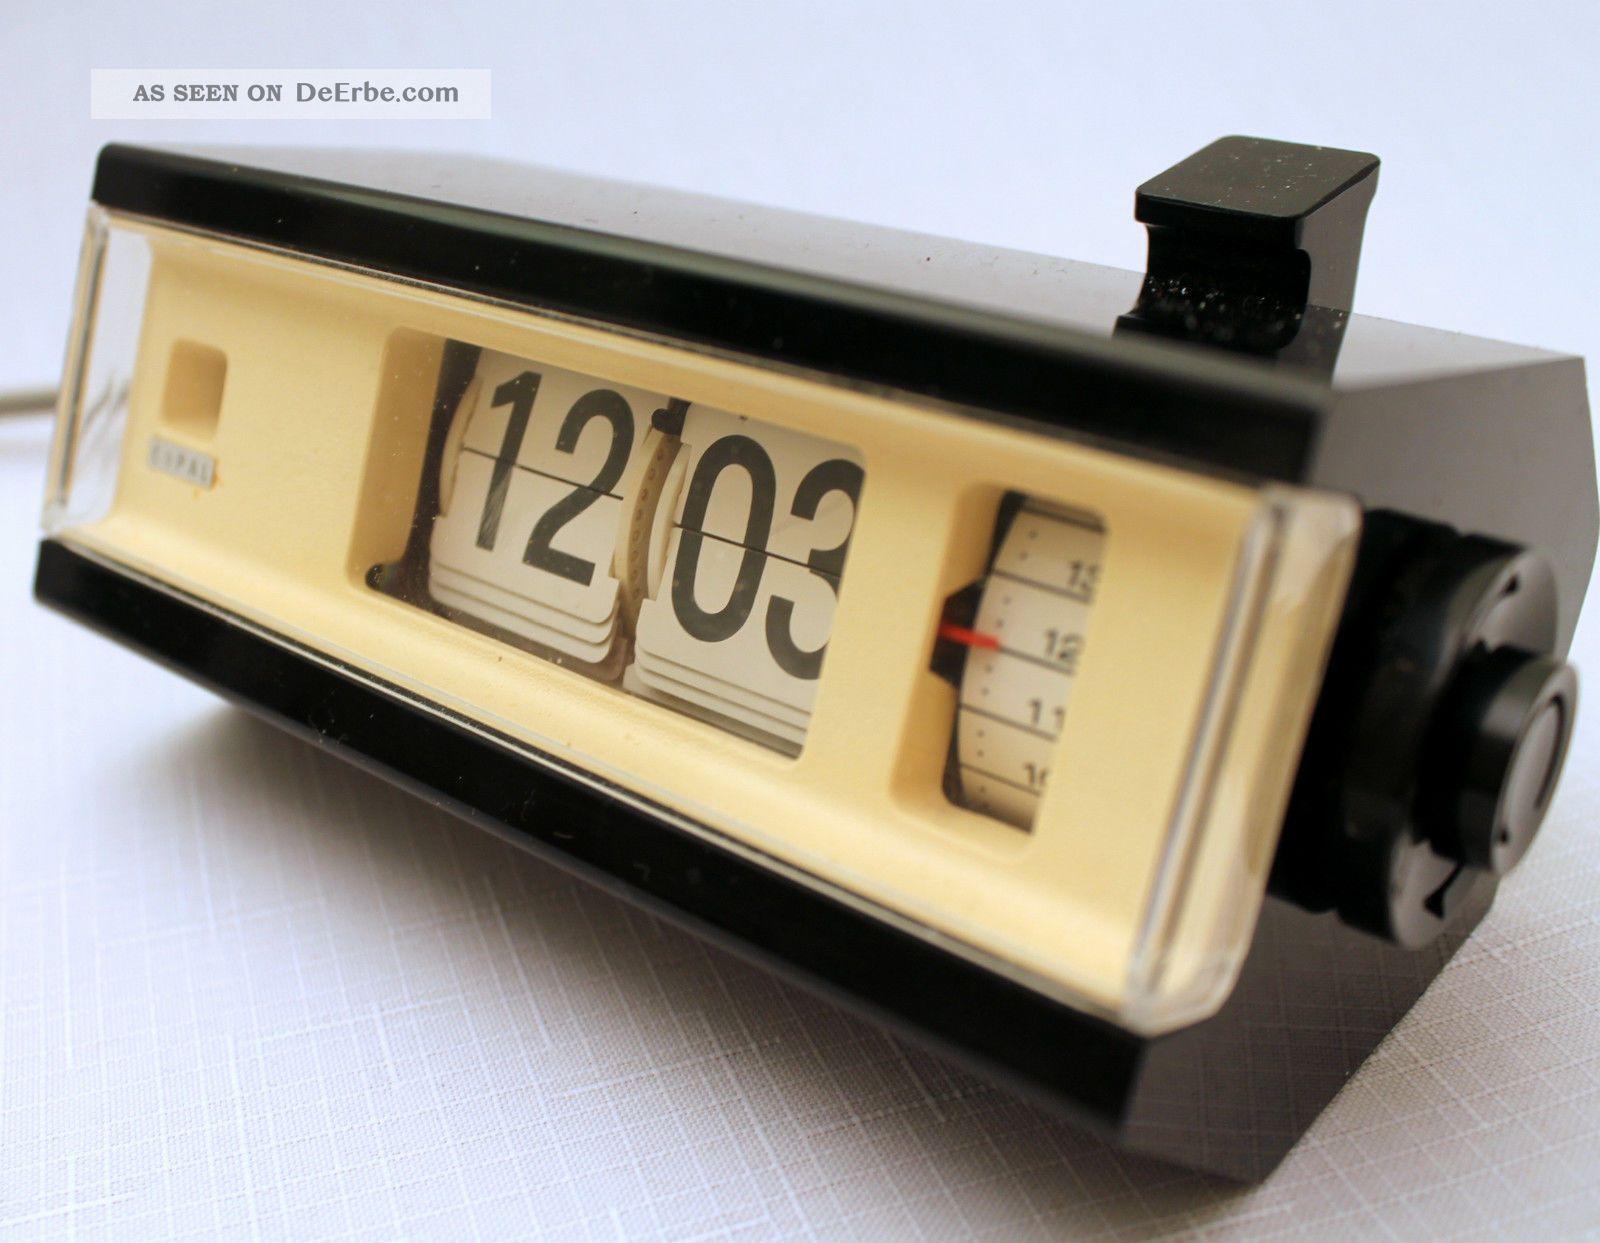 copal japan 227 klappzahlen wecker tischuhr flip clock. Black Bedroom Furniture Sets. Home Design Ideas